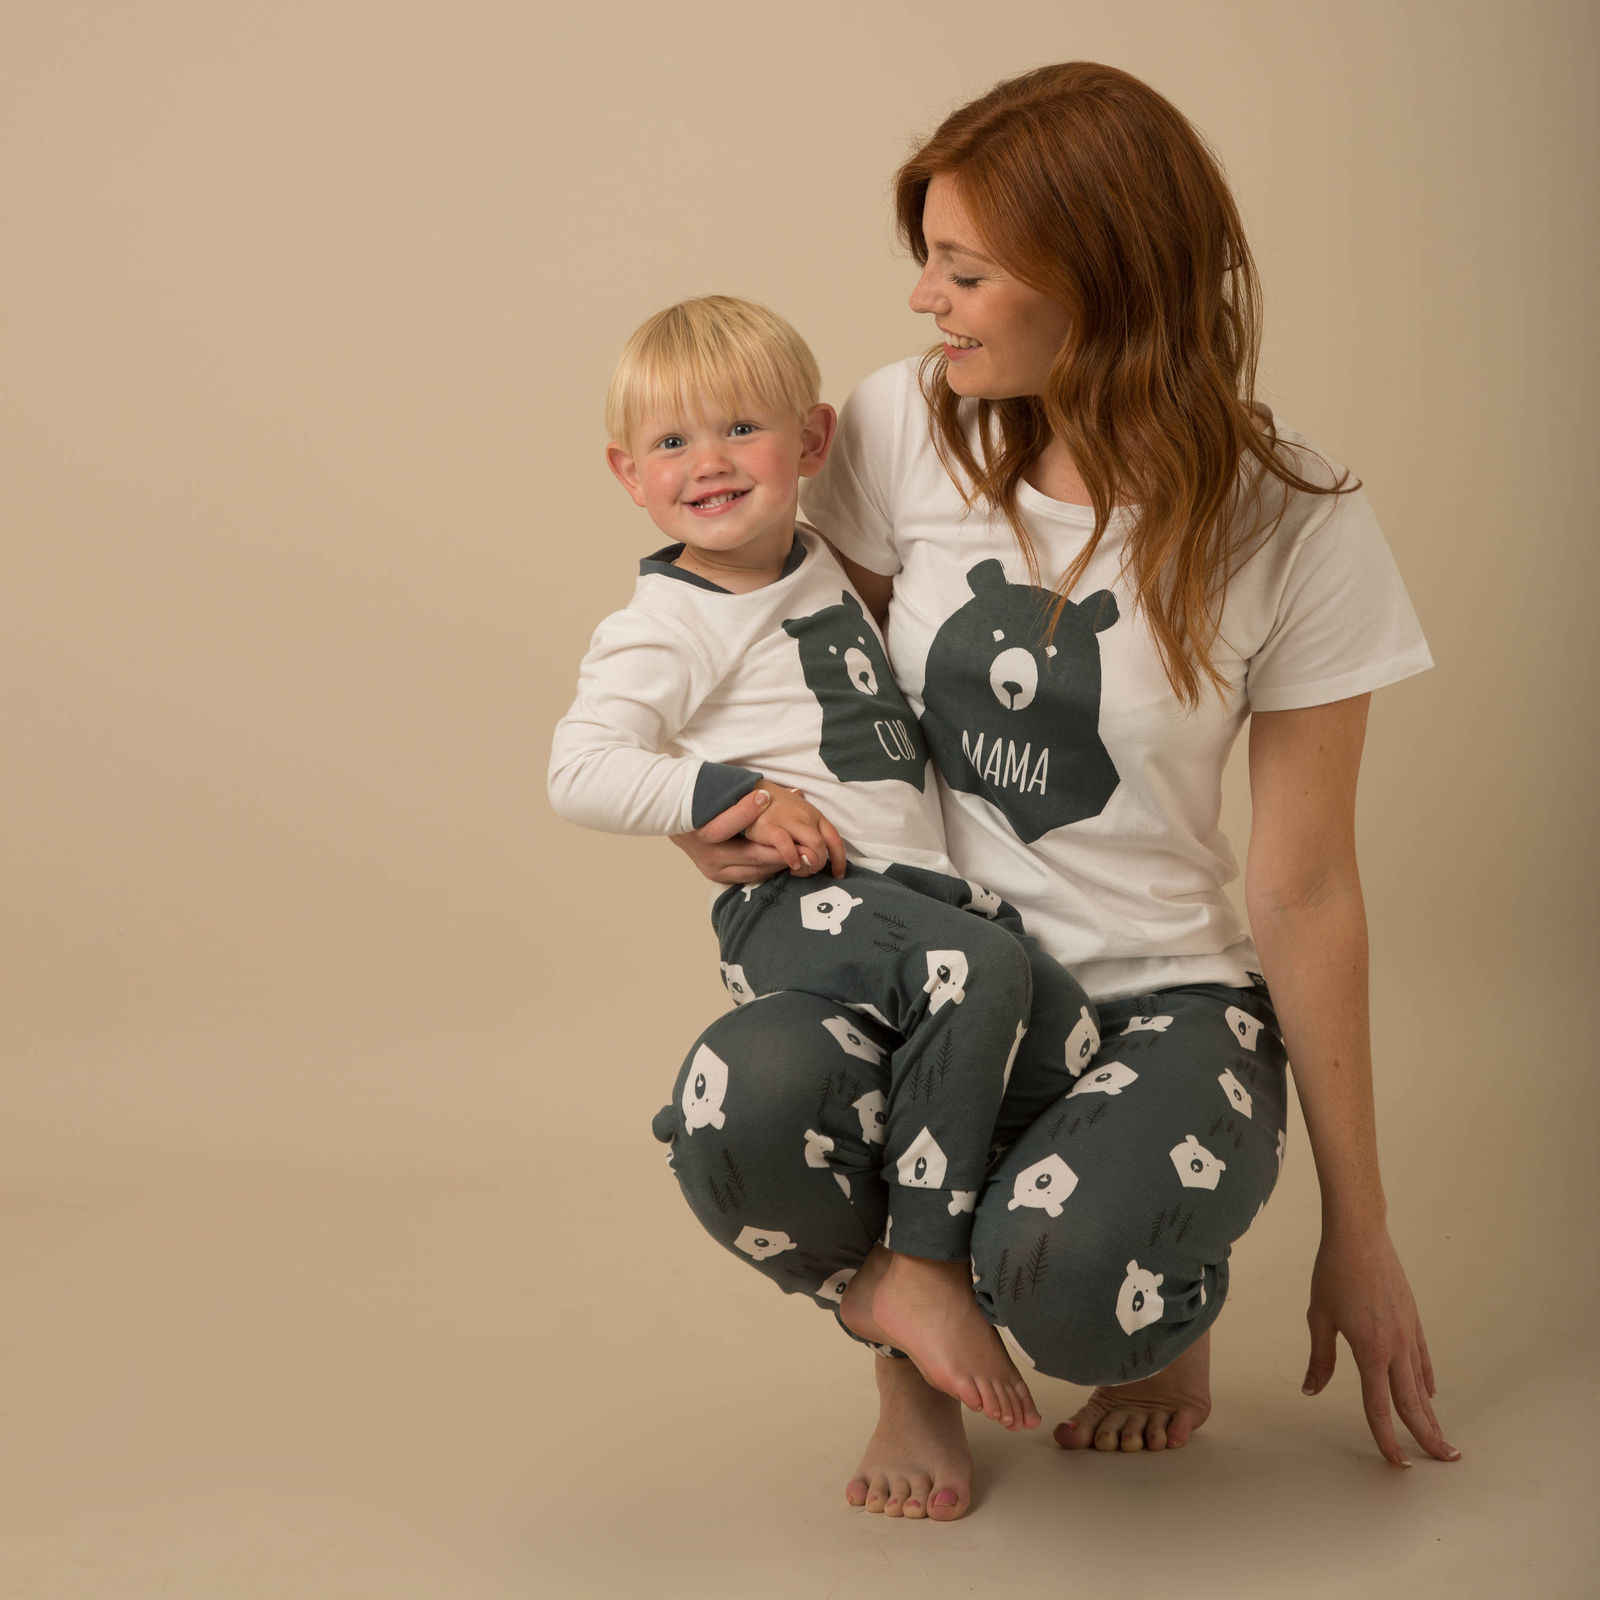 ... Winter Warm Christmas Bear Printing Pyjamas Matching Family PJs  Nightwear Adult Mum Dad Kid ... 29e456e8f